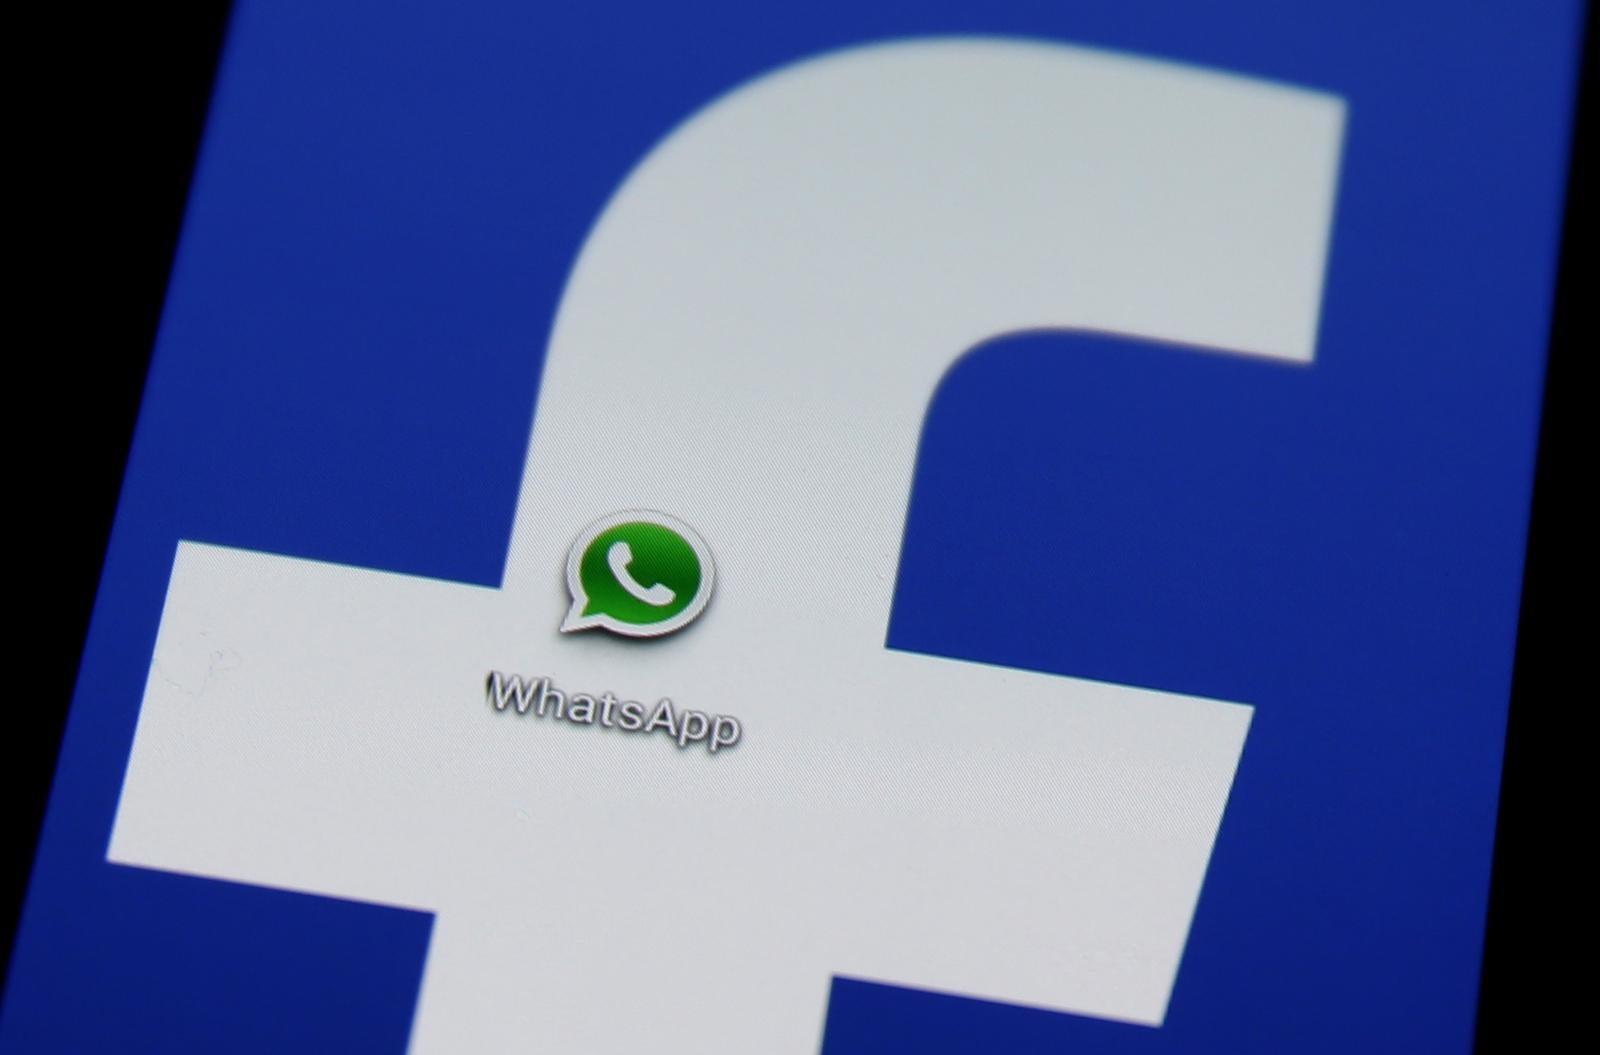 Facebook stops WhatsApp data sharing in Europe